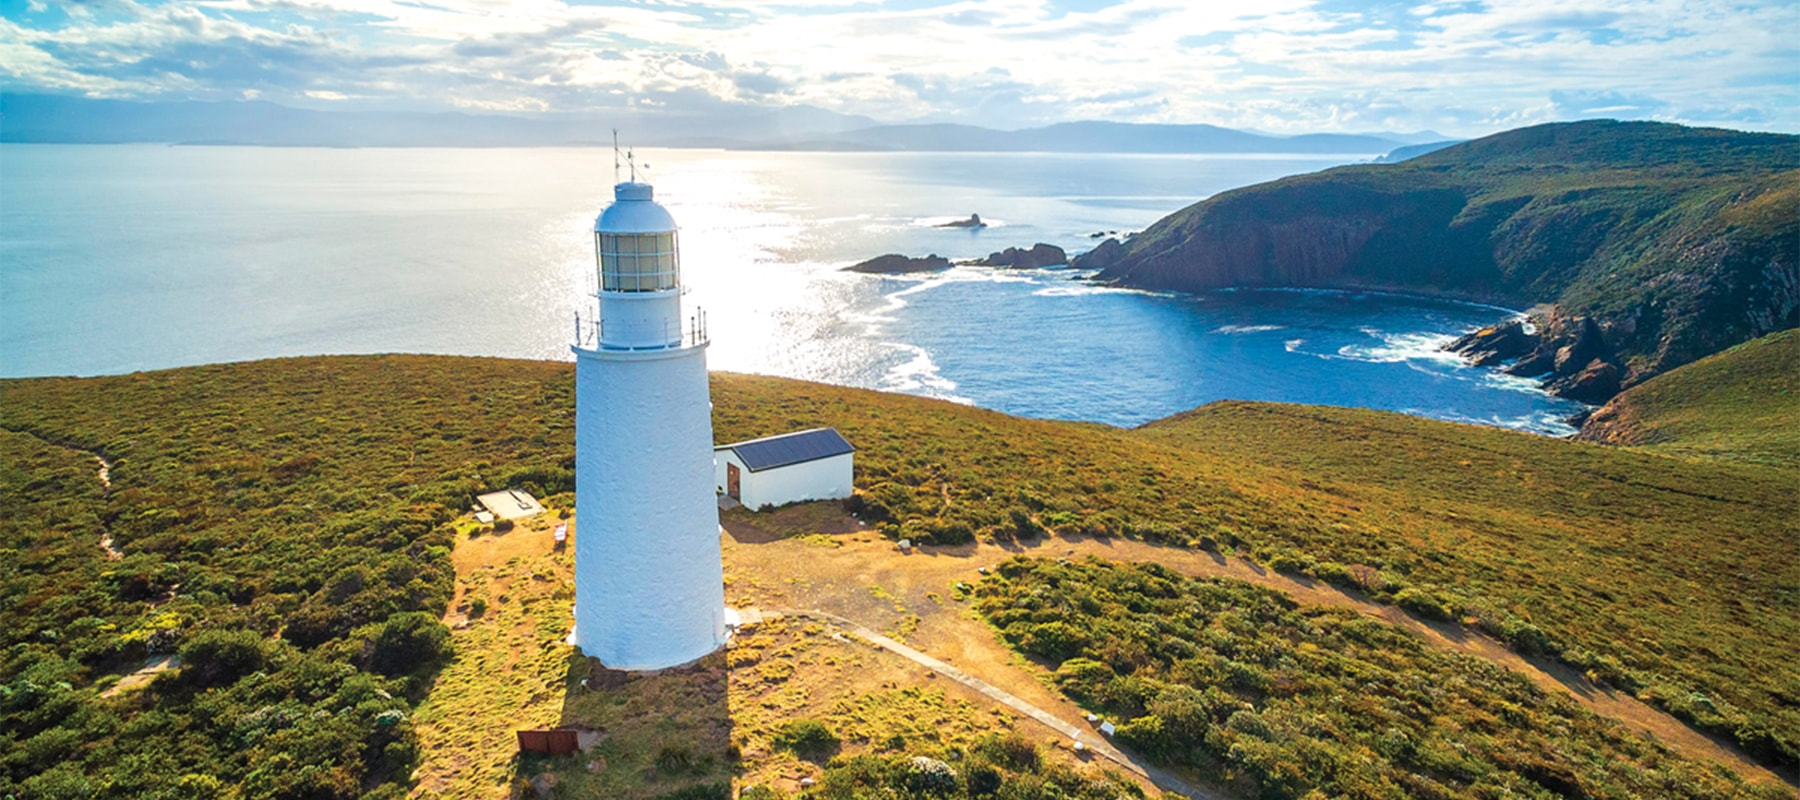 Bruny Island - Image Credit Yachting Australia - Alamy / Piter Lenk